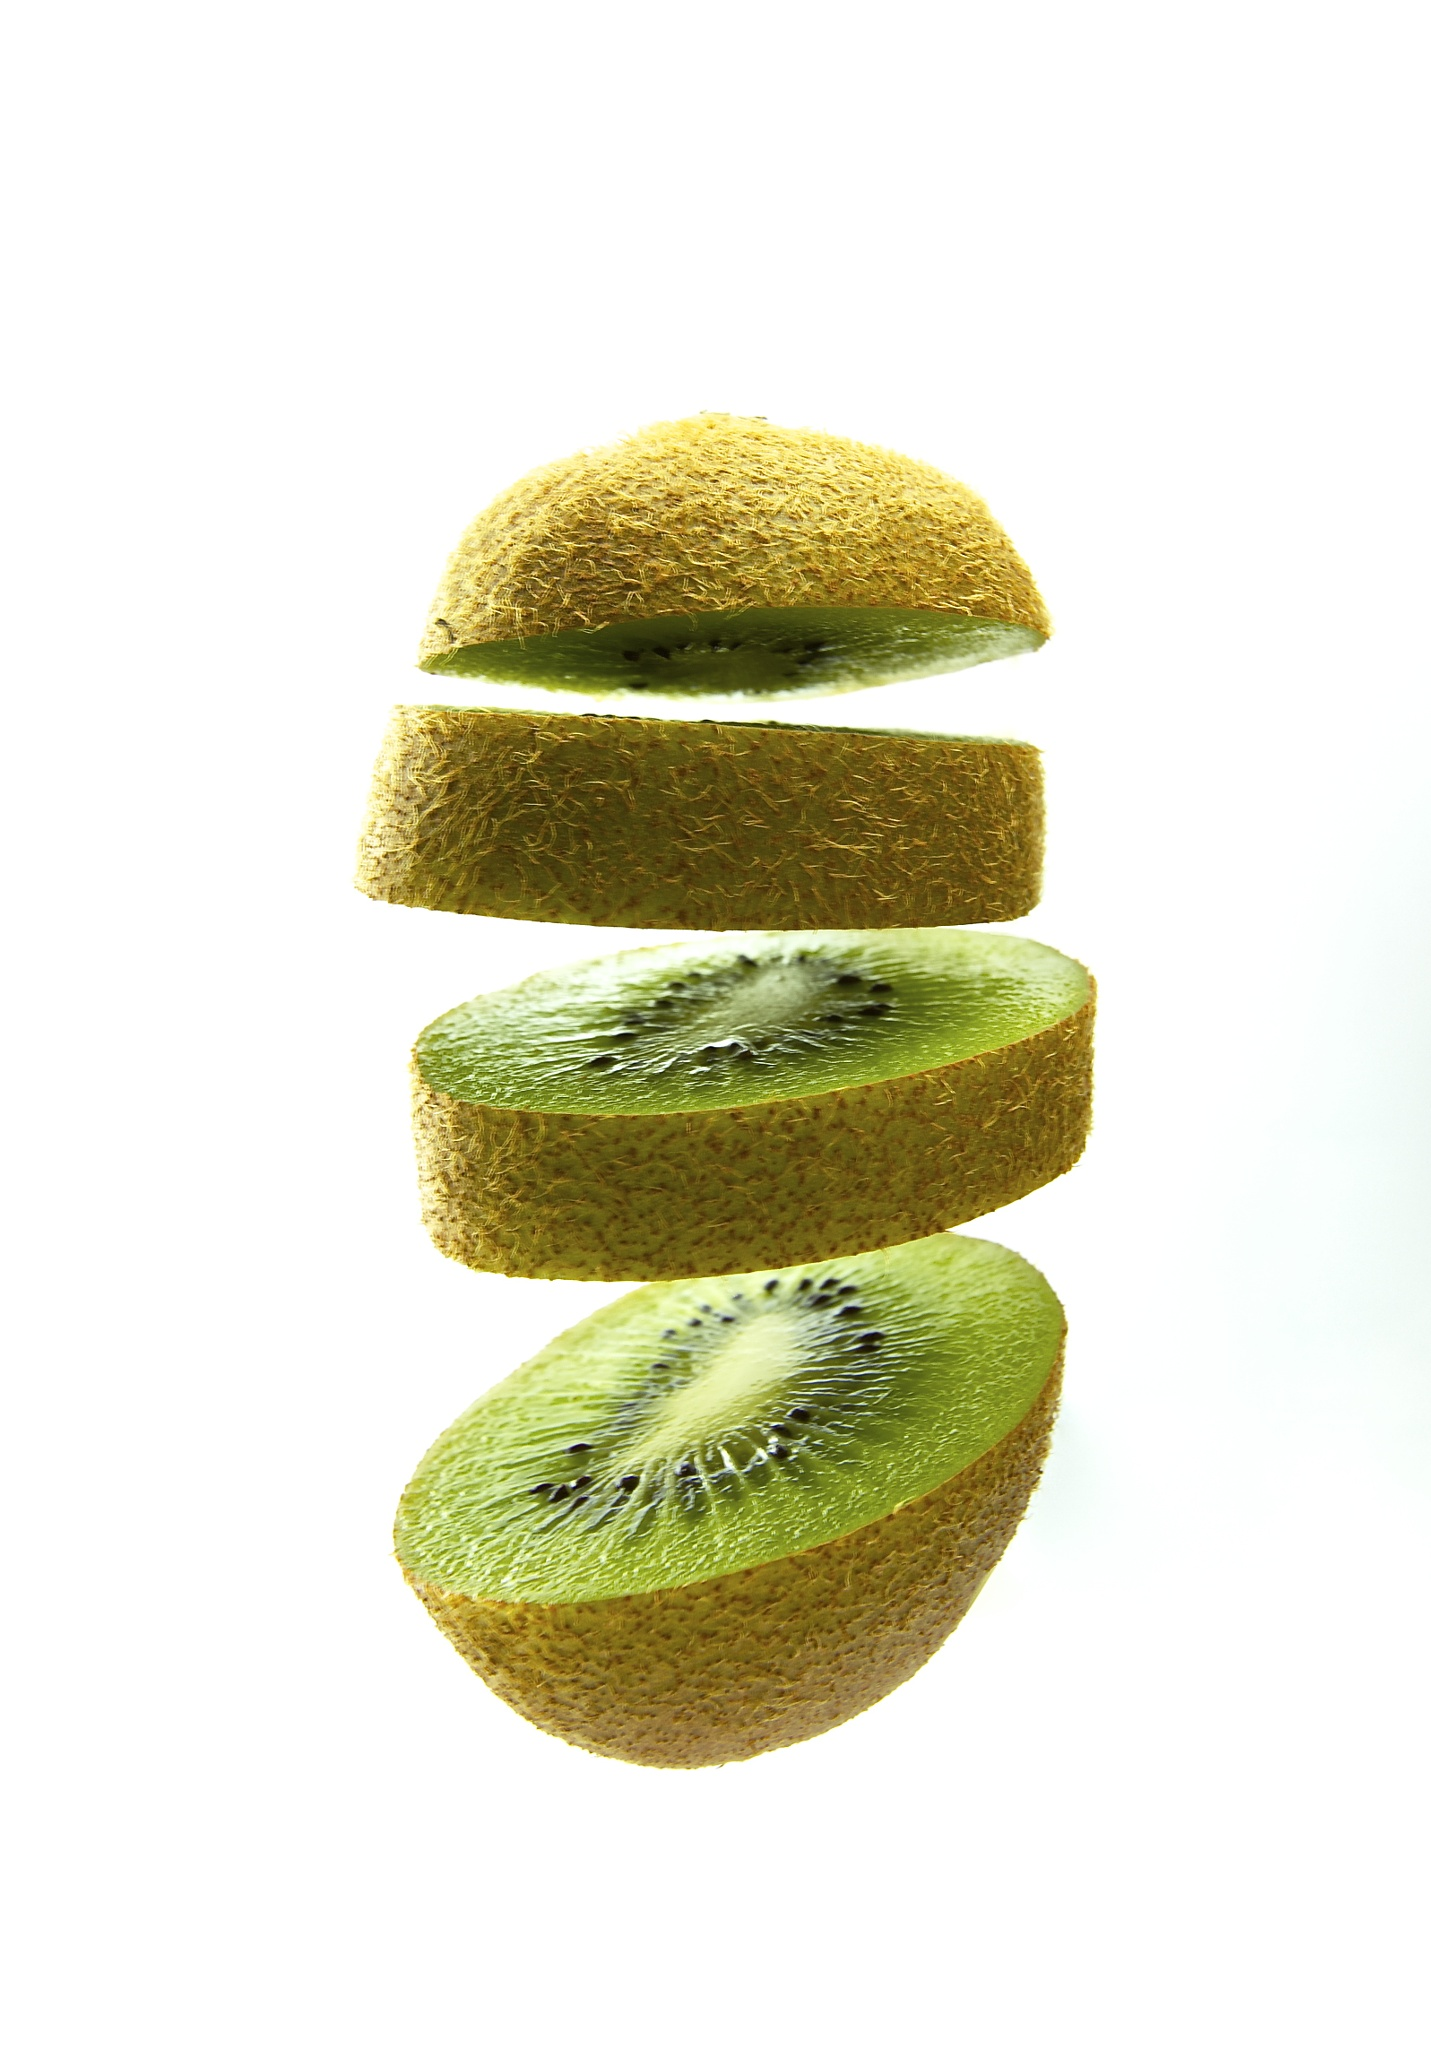 kiwi by Azucena Kouwenhoven